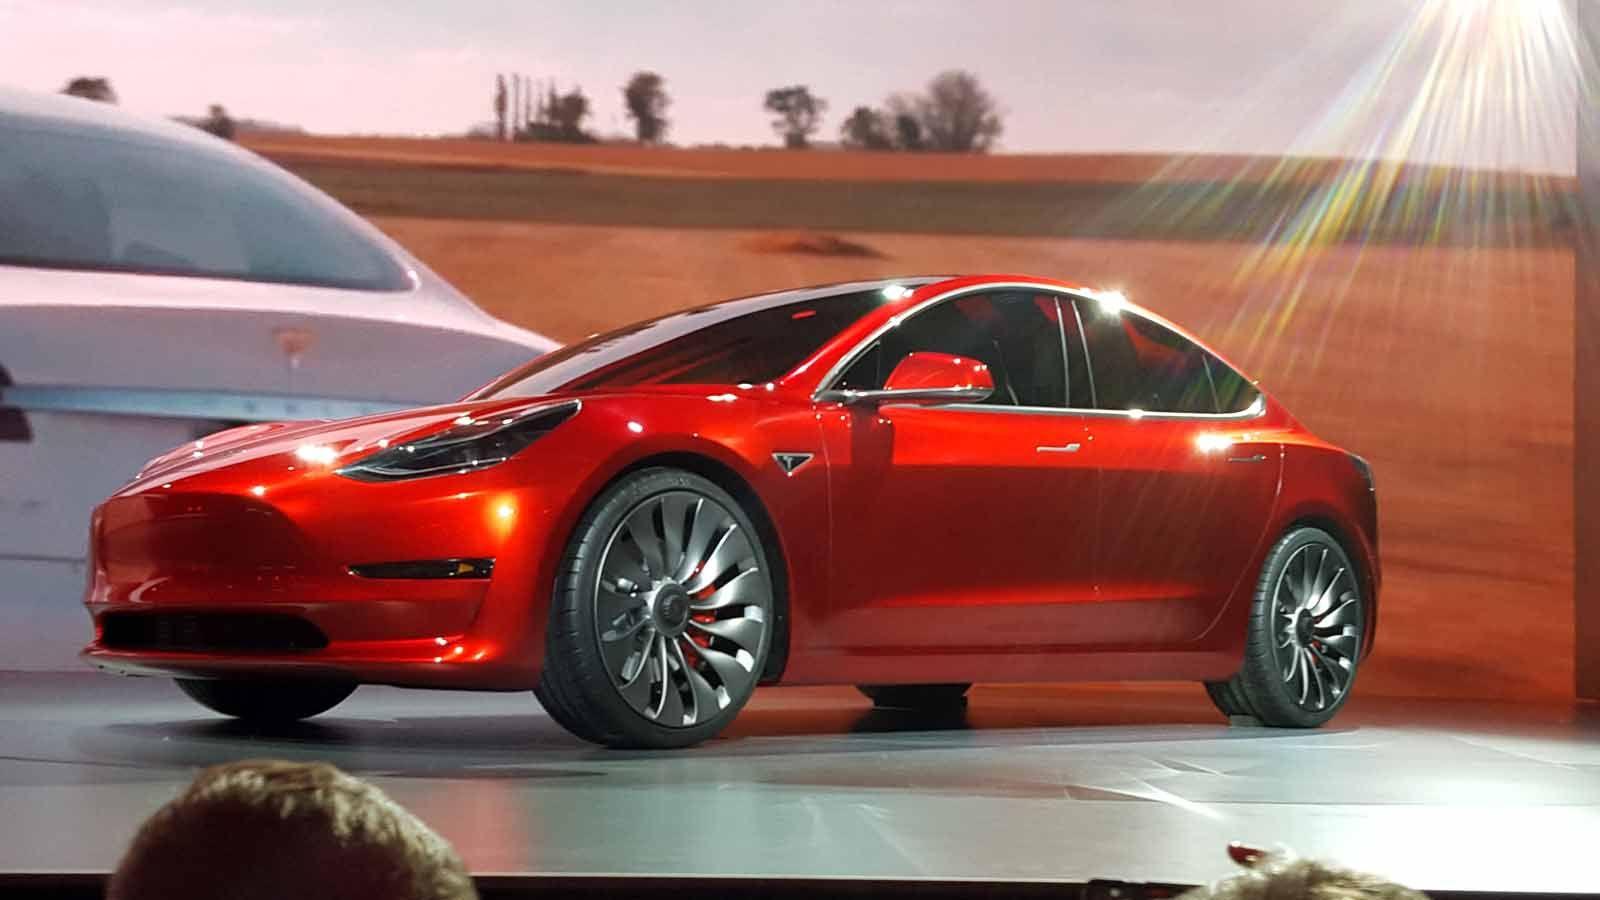 Tesla Model S iPhone 6/6 plus wallpaper Авто